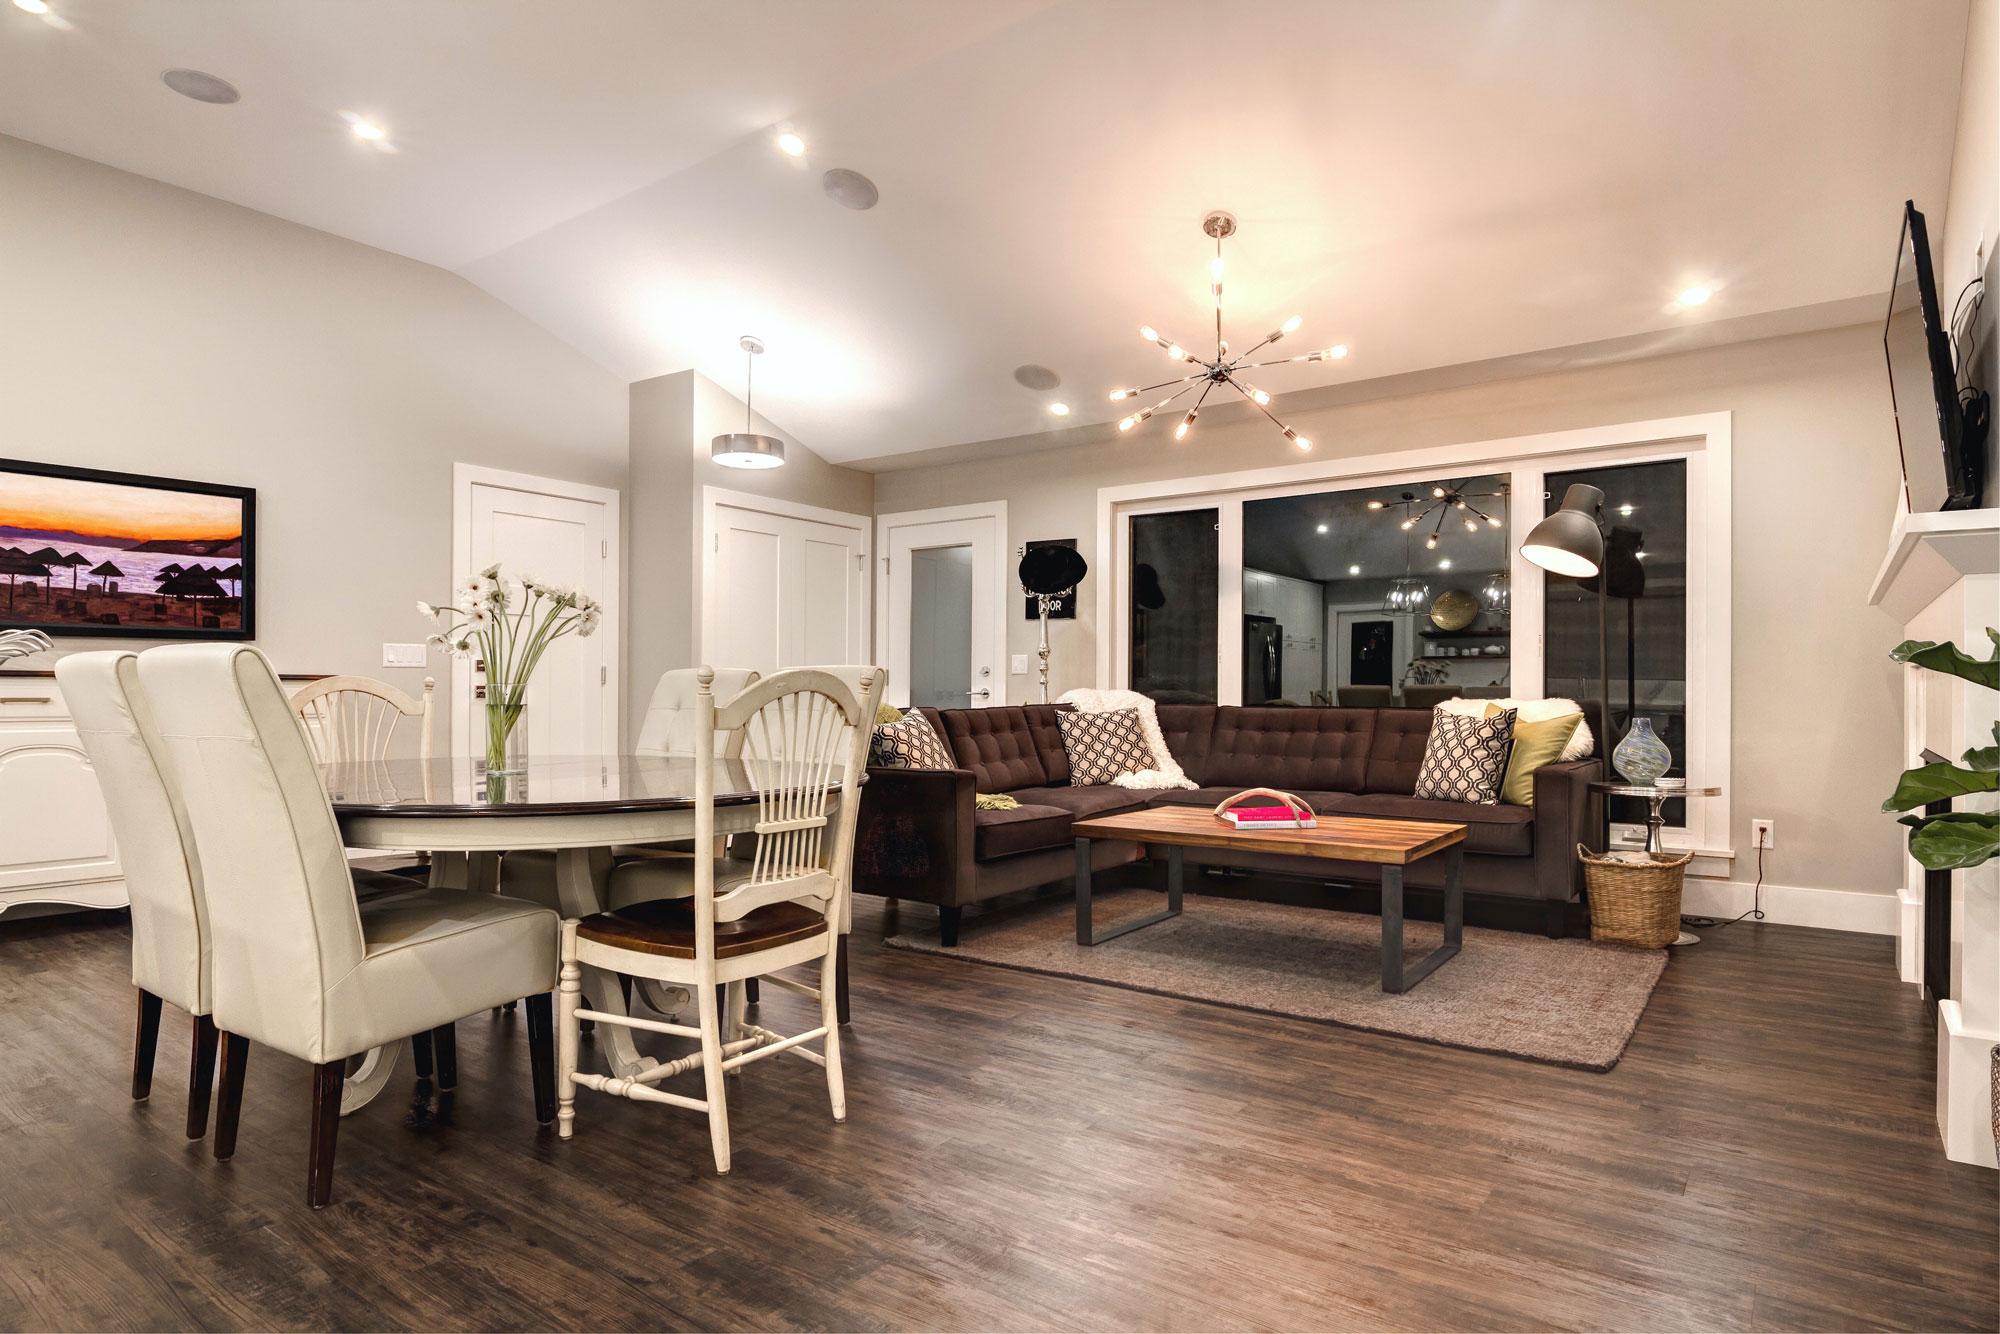 Living Room with Hardwood Floors remodel by Style Developments in Calgary Alberta